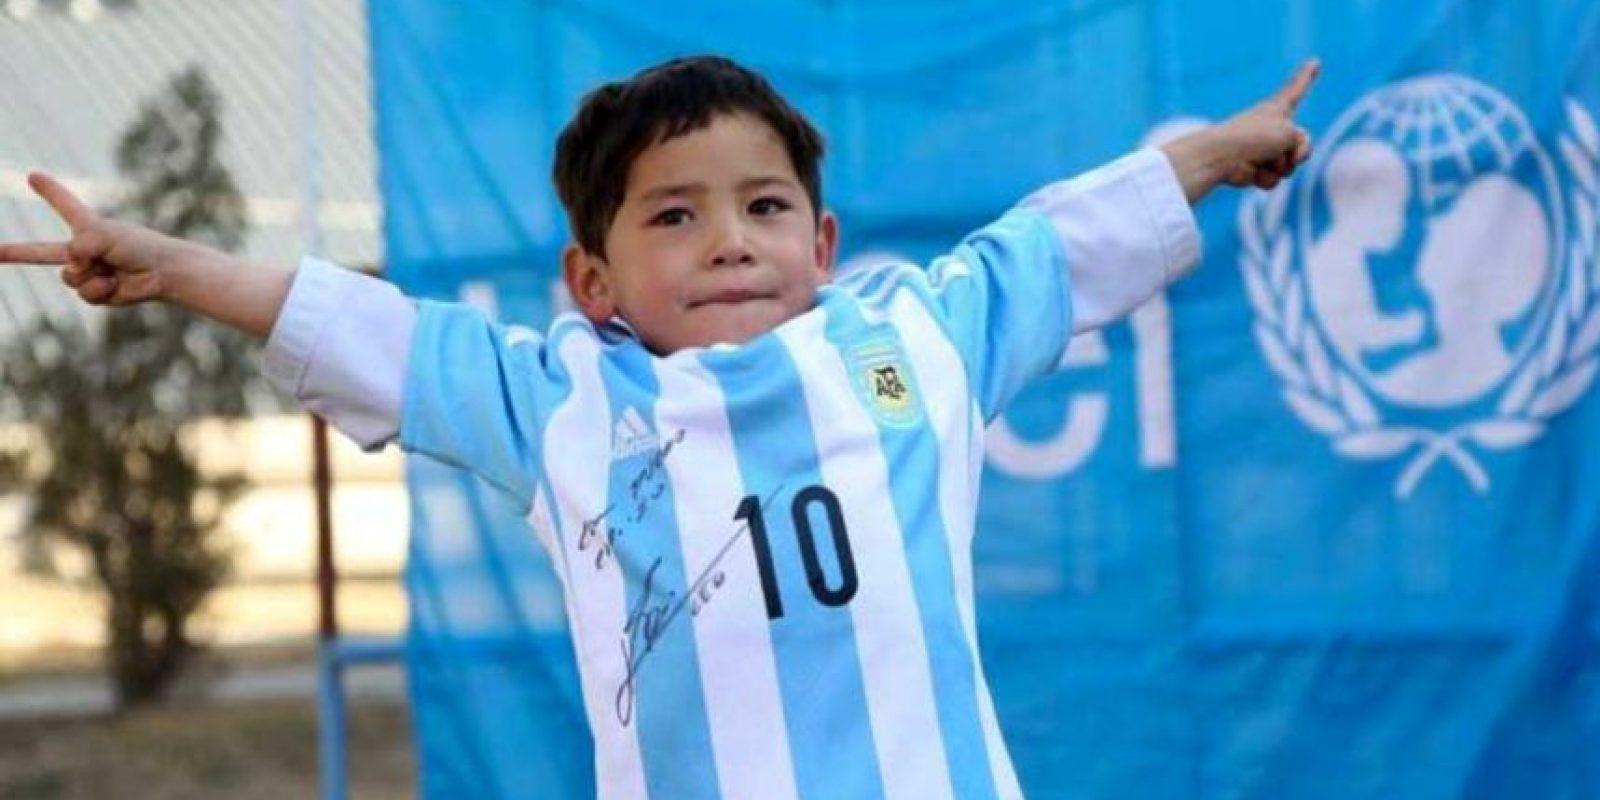 Foto:Unicef Argentina